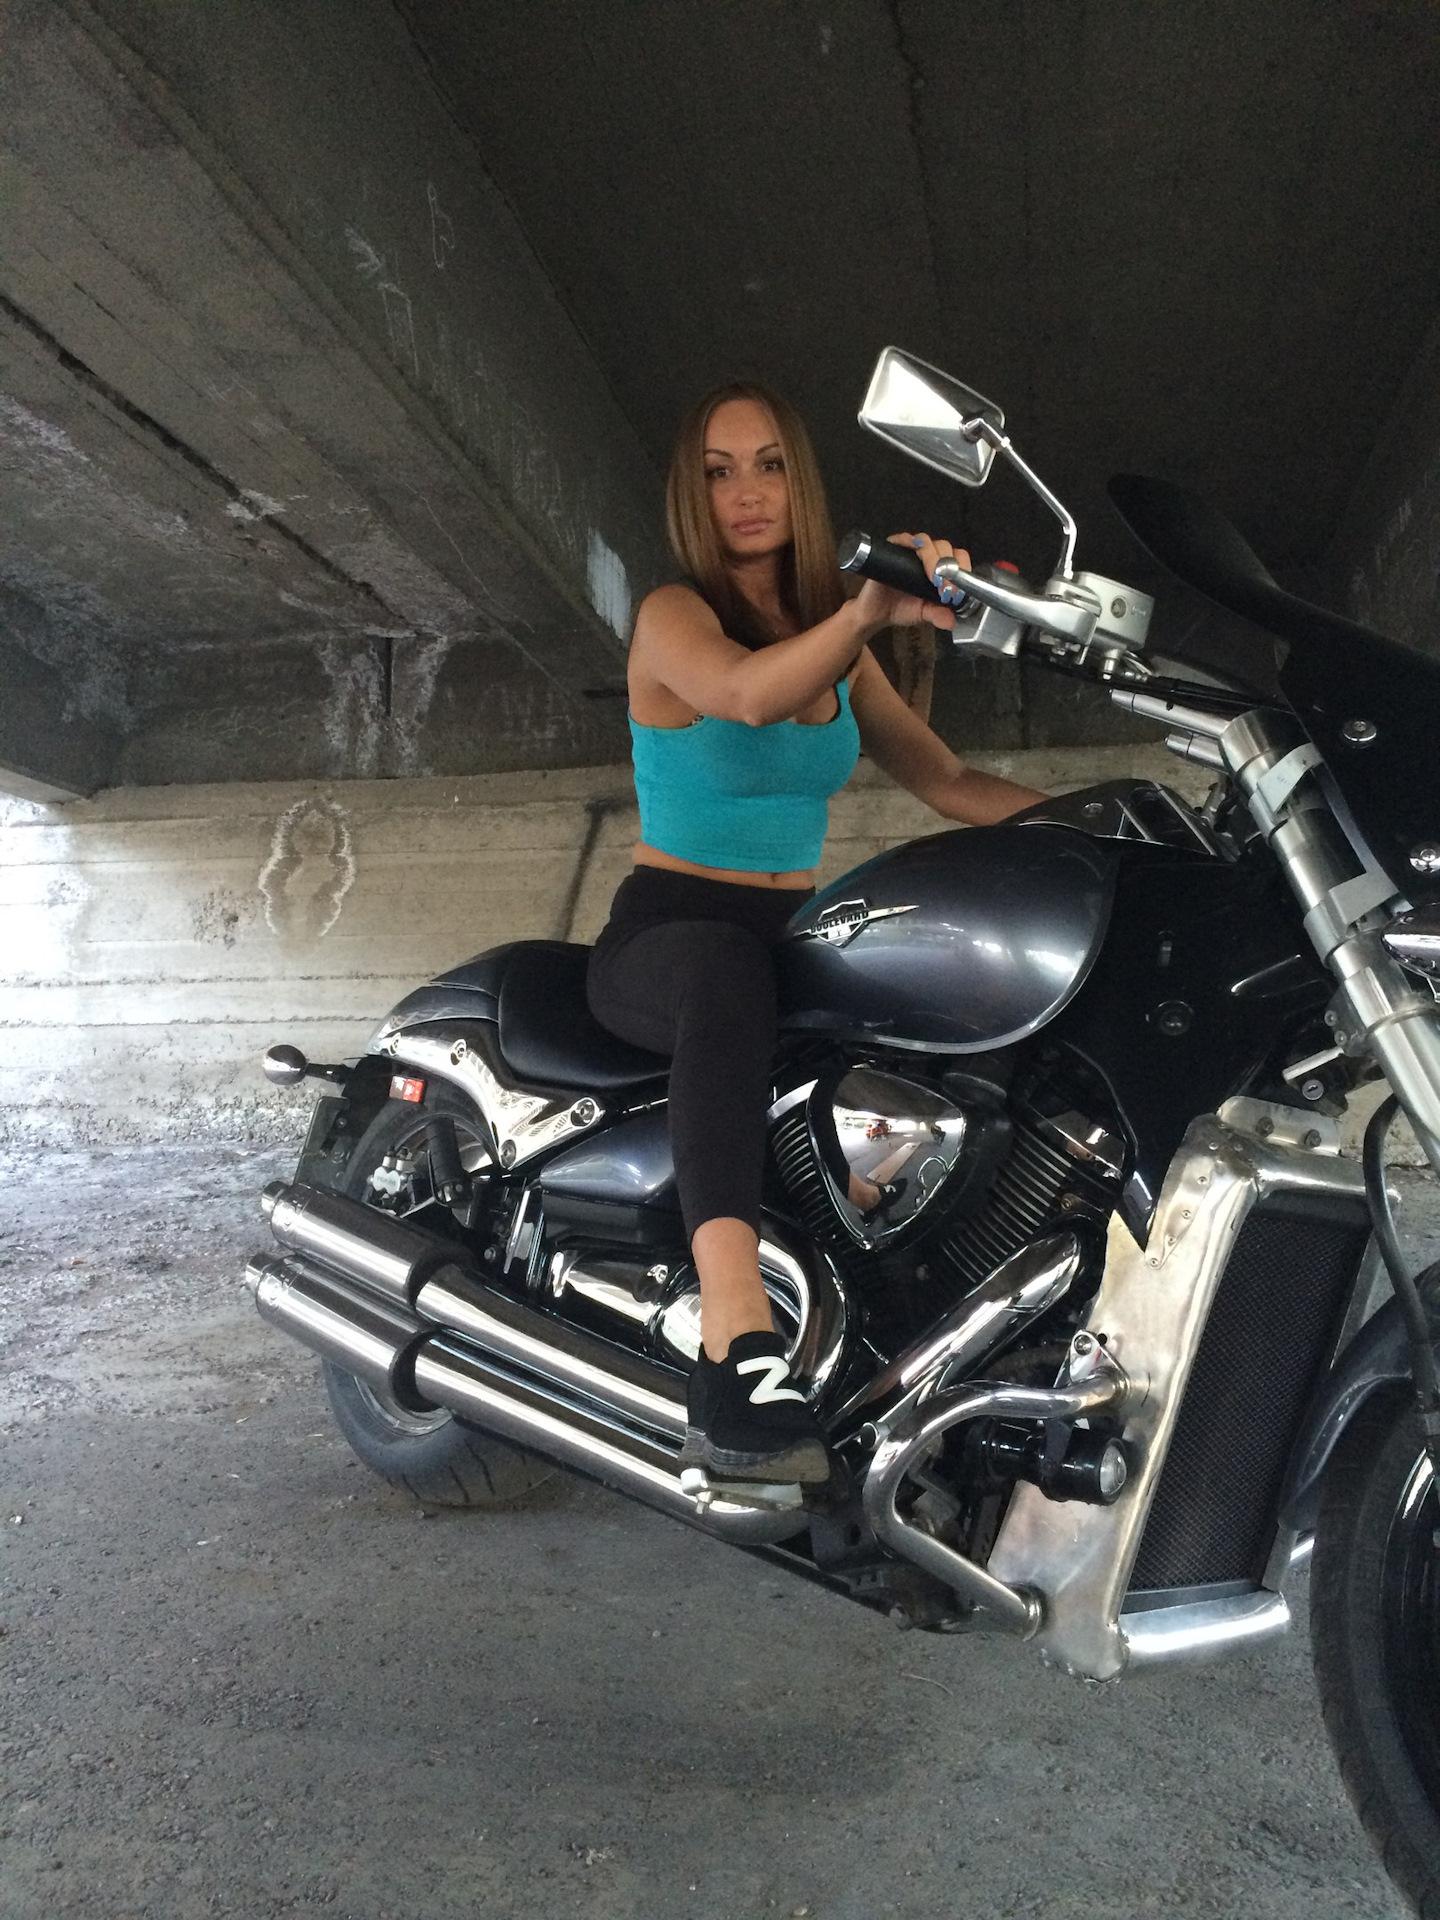 Он на мотоцикле жена наездница, порно скрытая камера русская общага